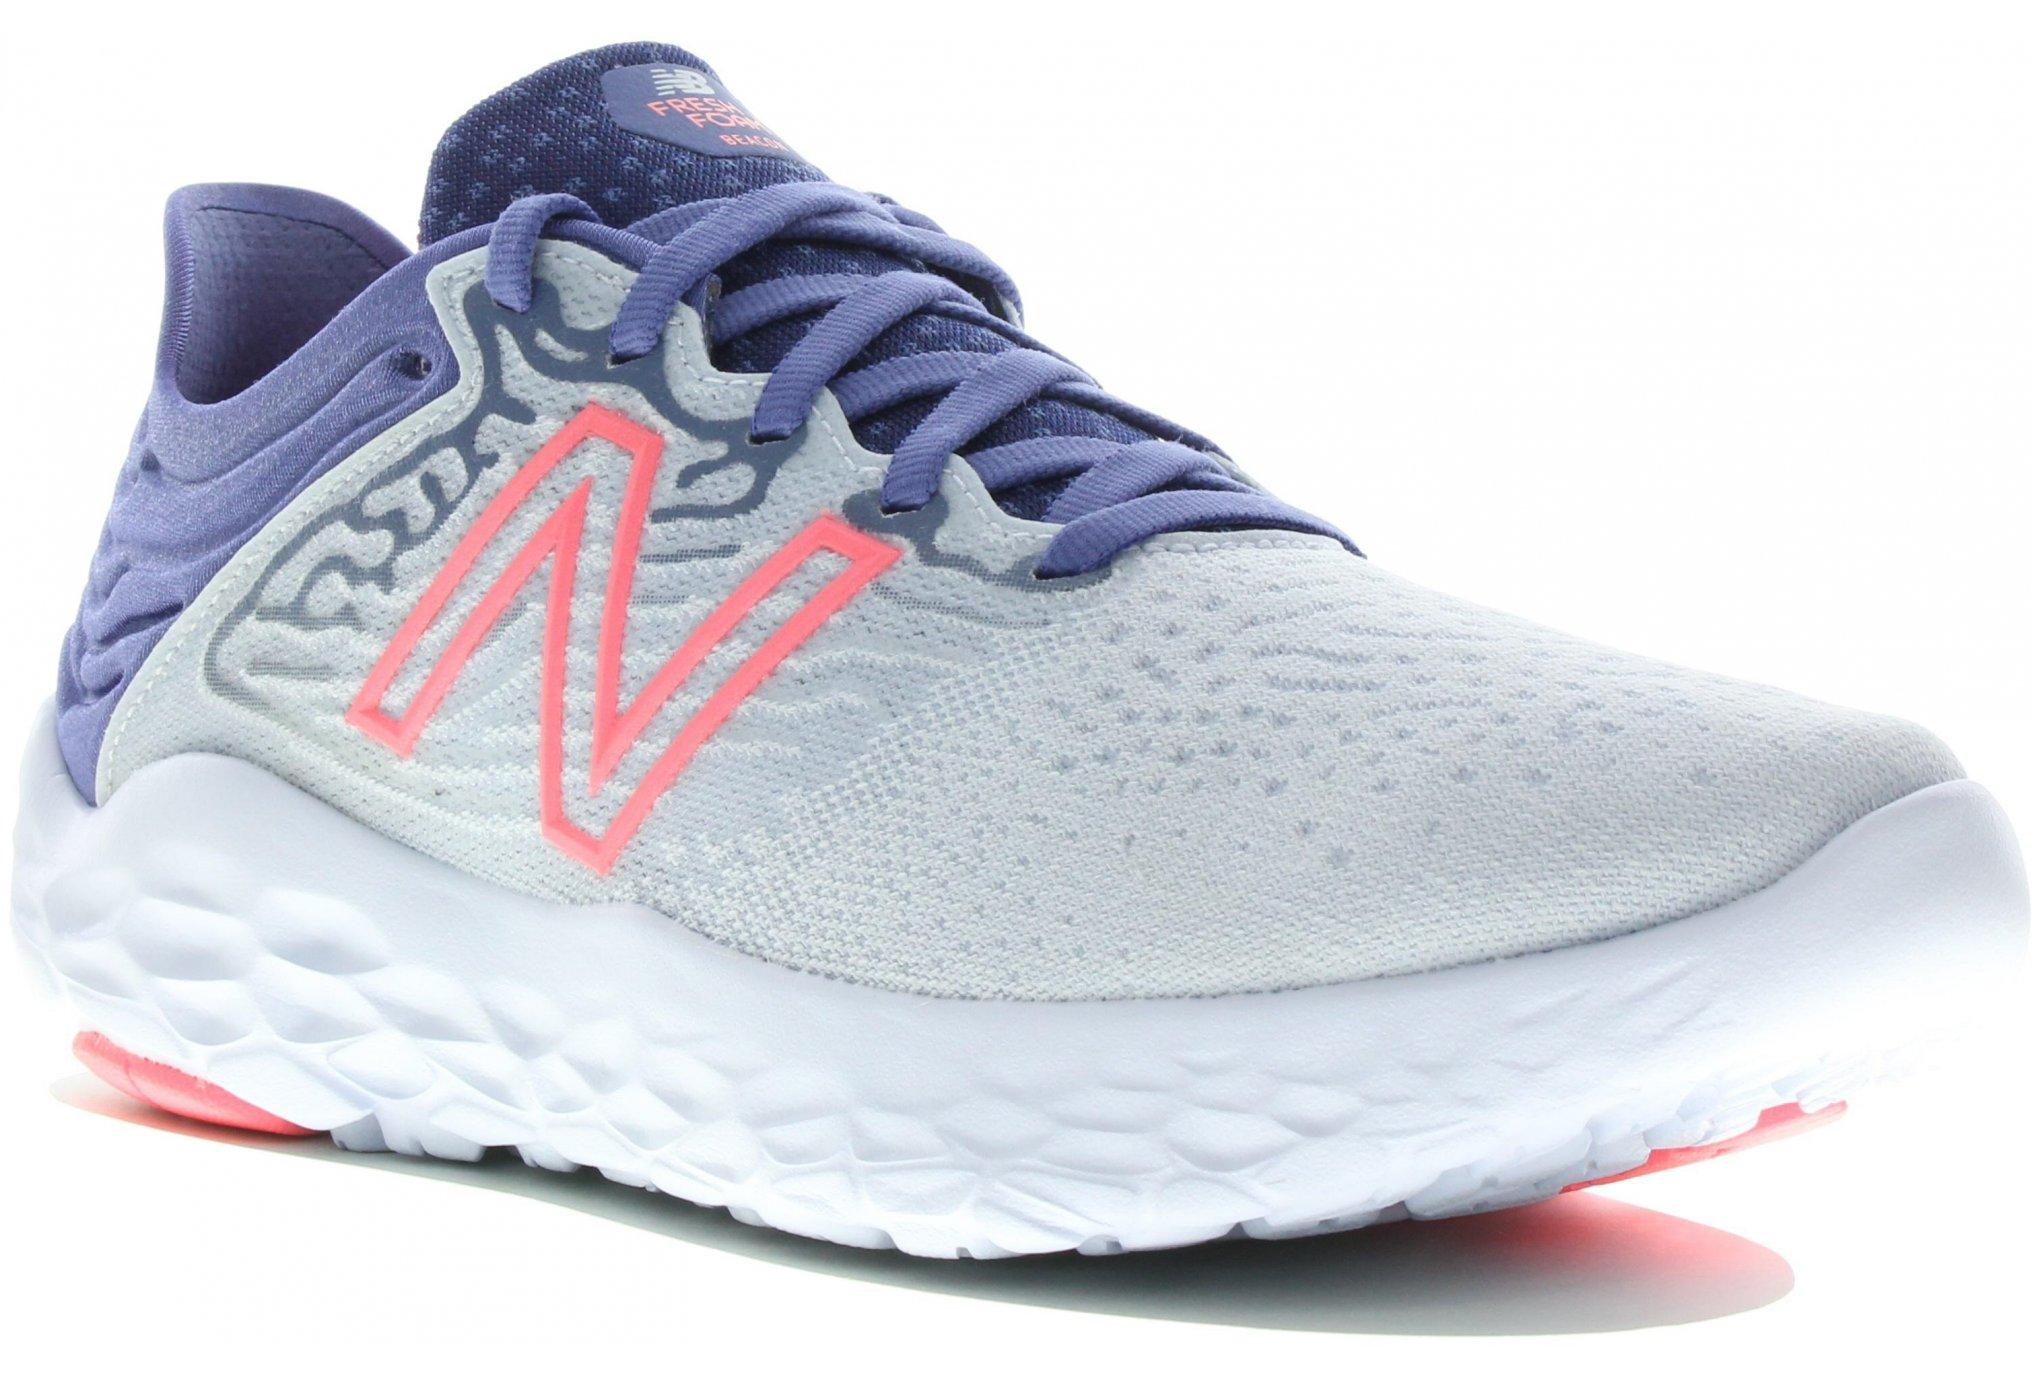 New Balance Fresh Foam Beacon V3 Chaussures running femme